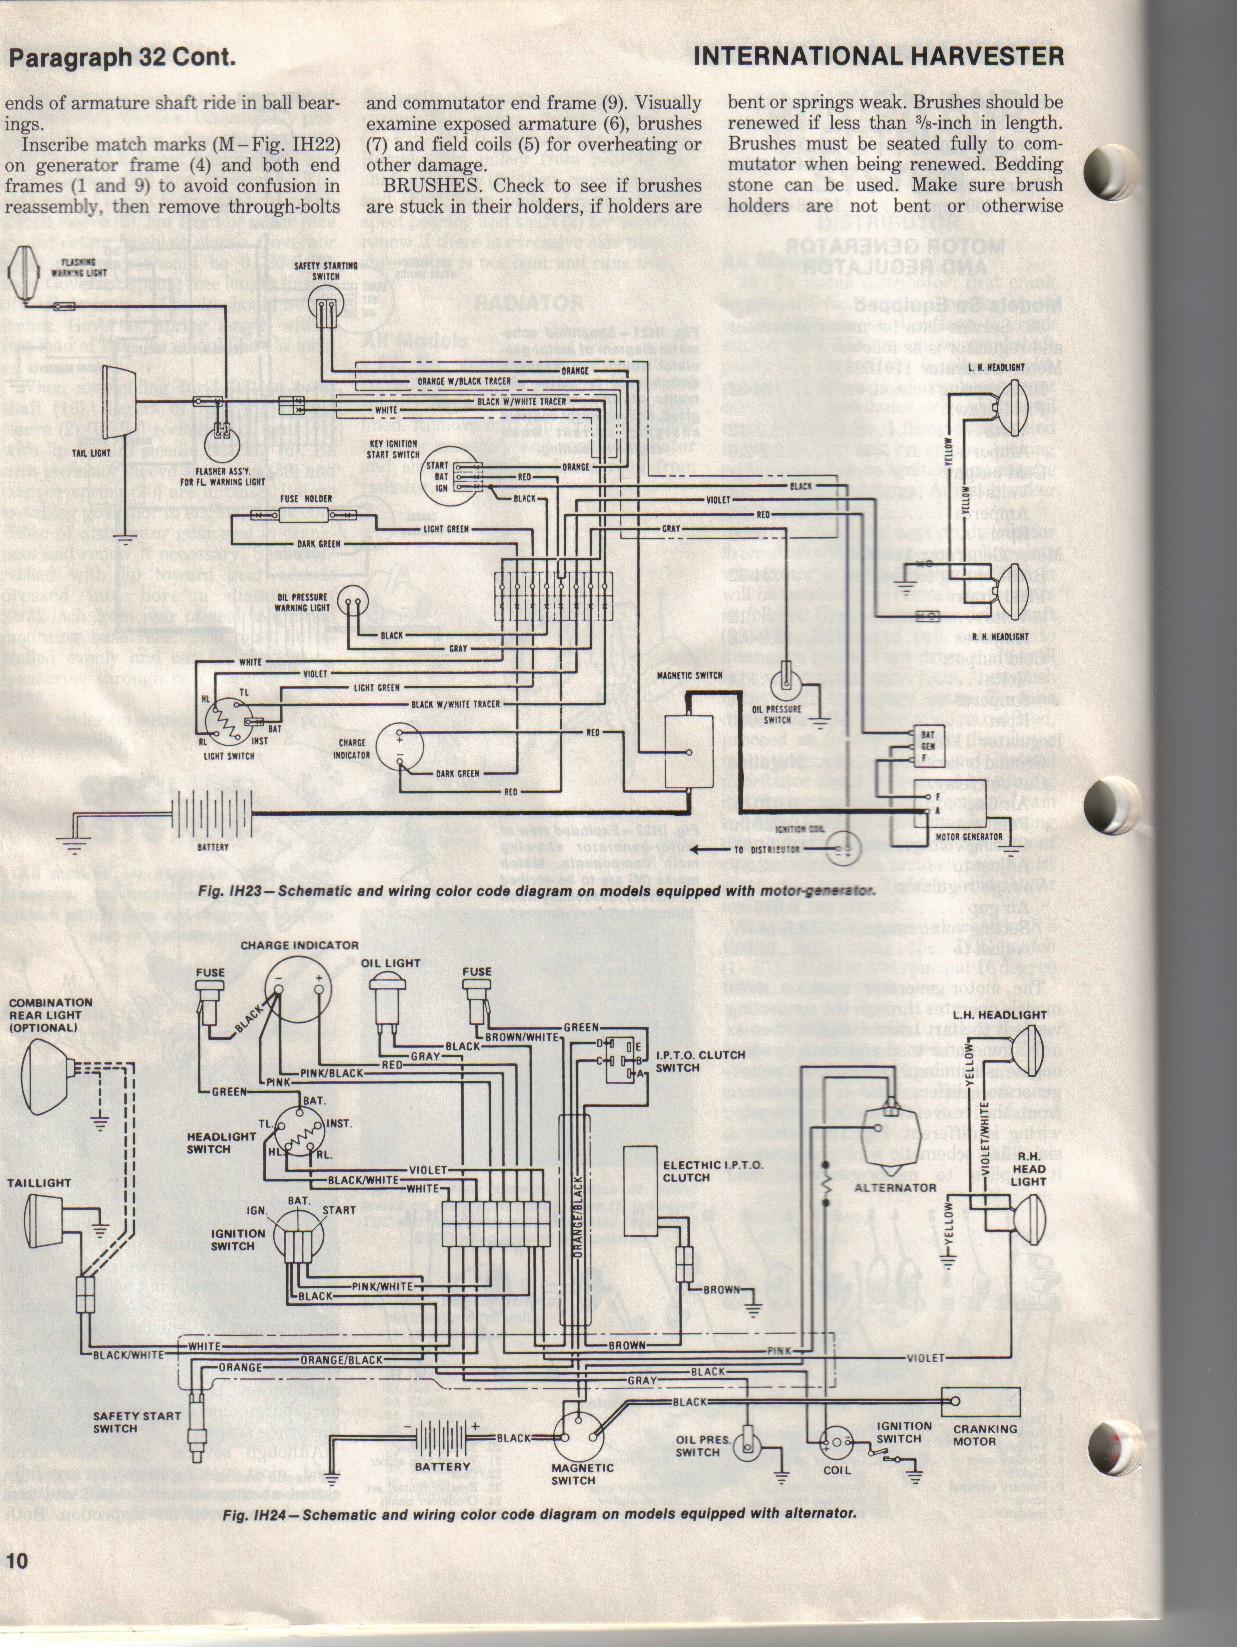 Amazing Alice Richards Southwire Photos - Wiring Diagram Ideas ...